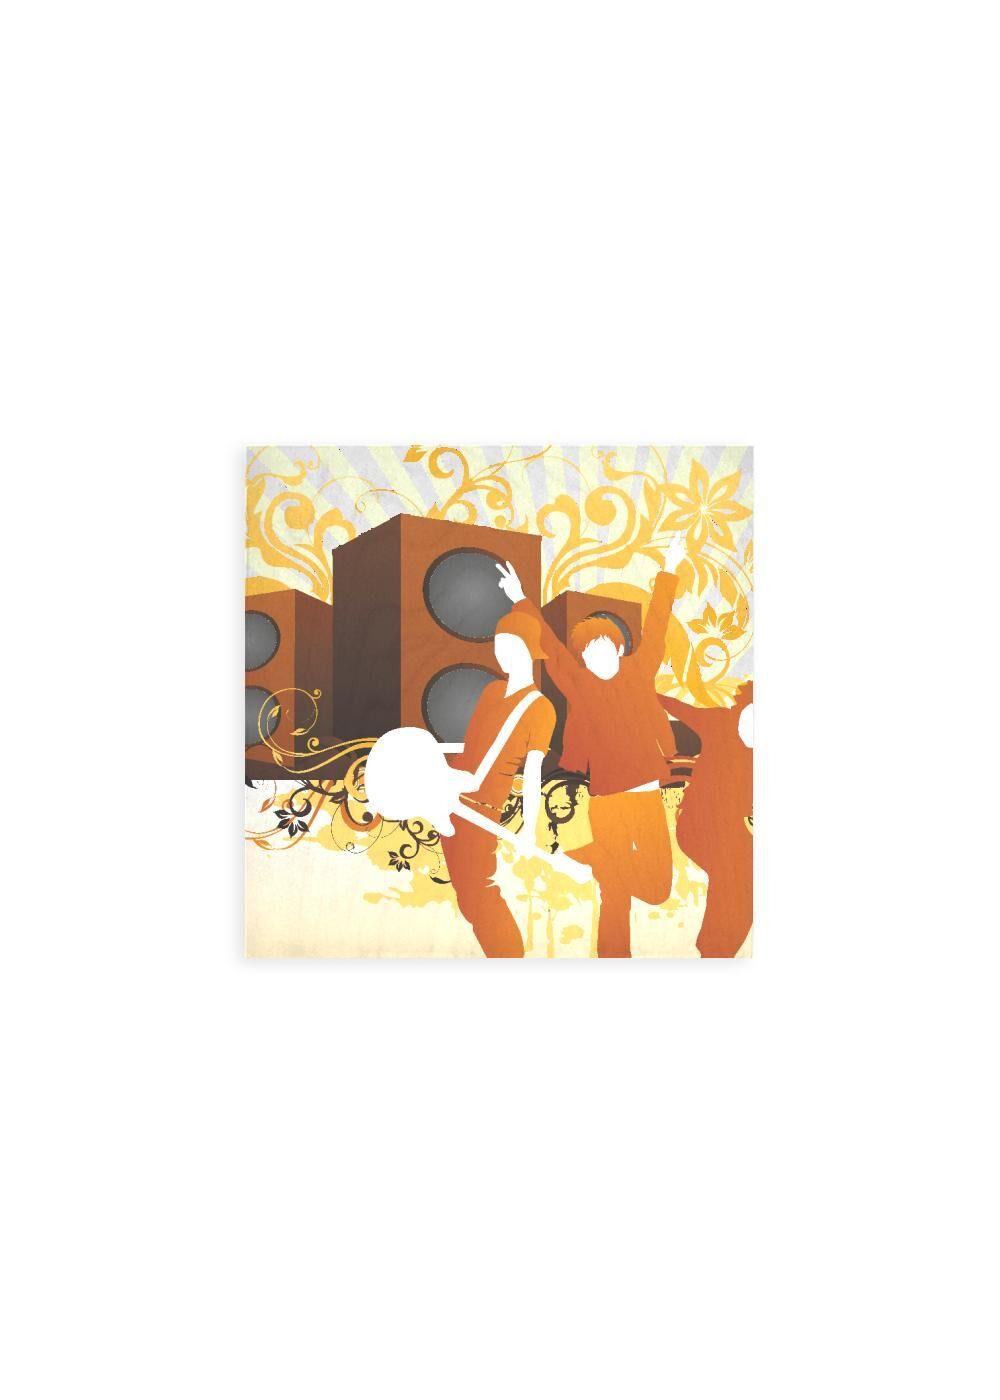 VIDA Wood Wall Art - 12x12 - Music Background by VIDA Original Artist  - Size: Small